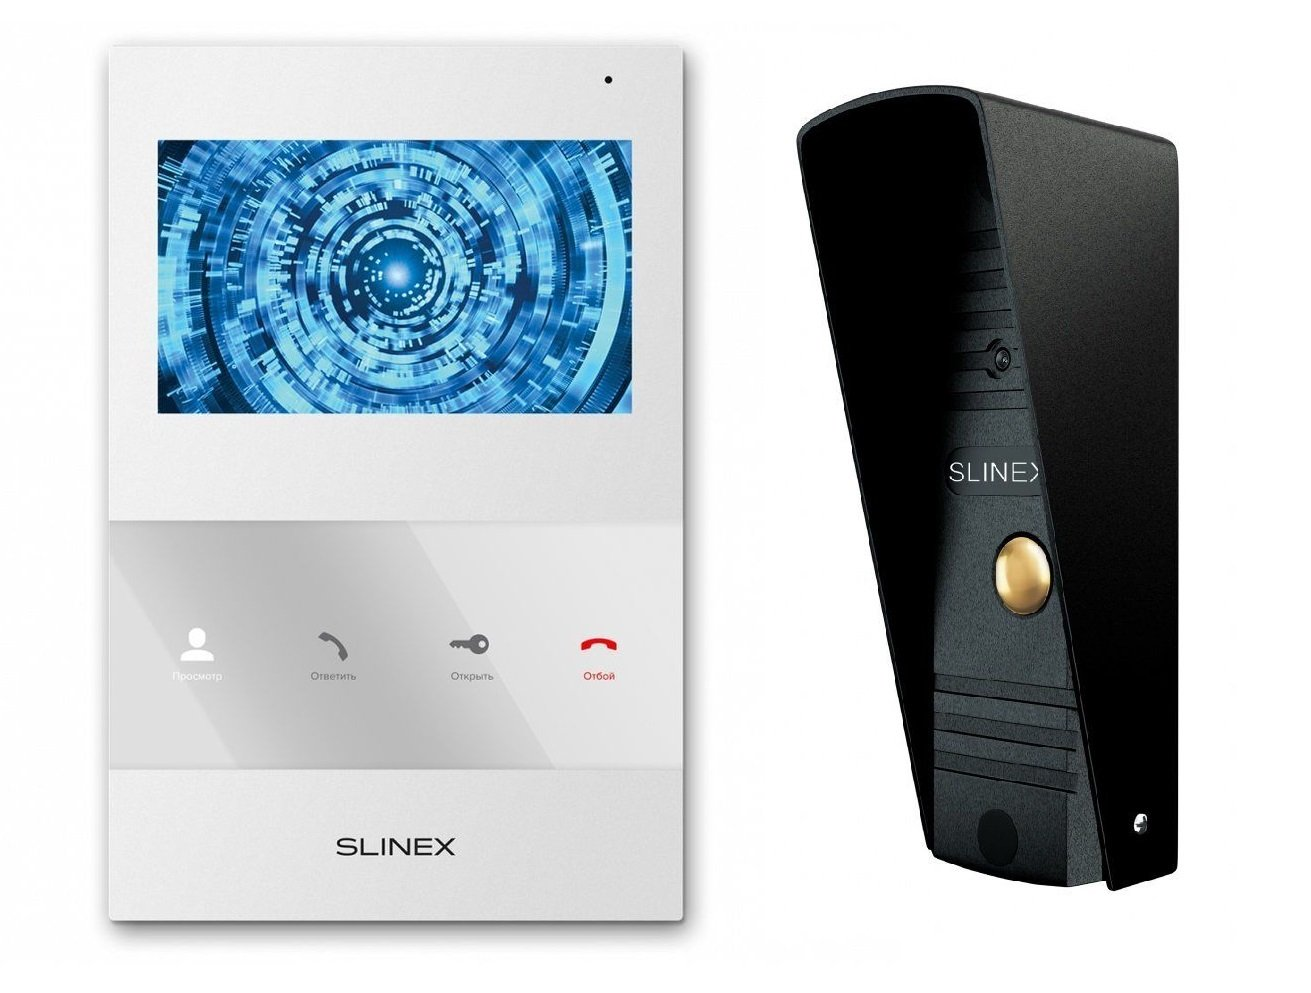 Комплект видеодомофона Slinex SQ-04M White + Панель Slinex ML-16HR Black фото